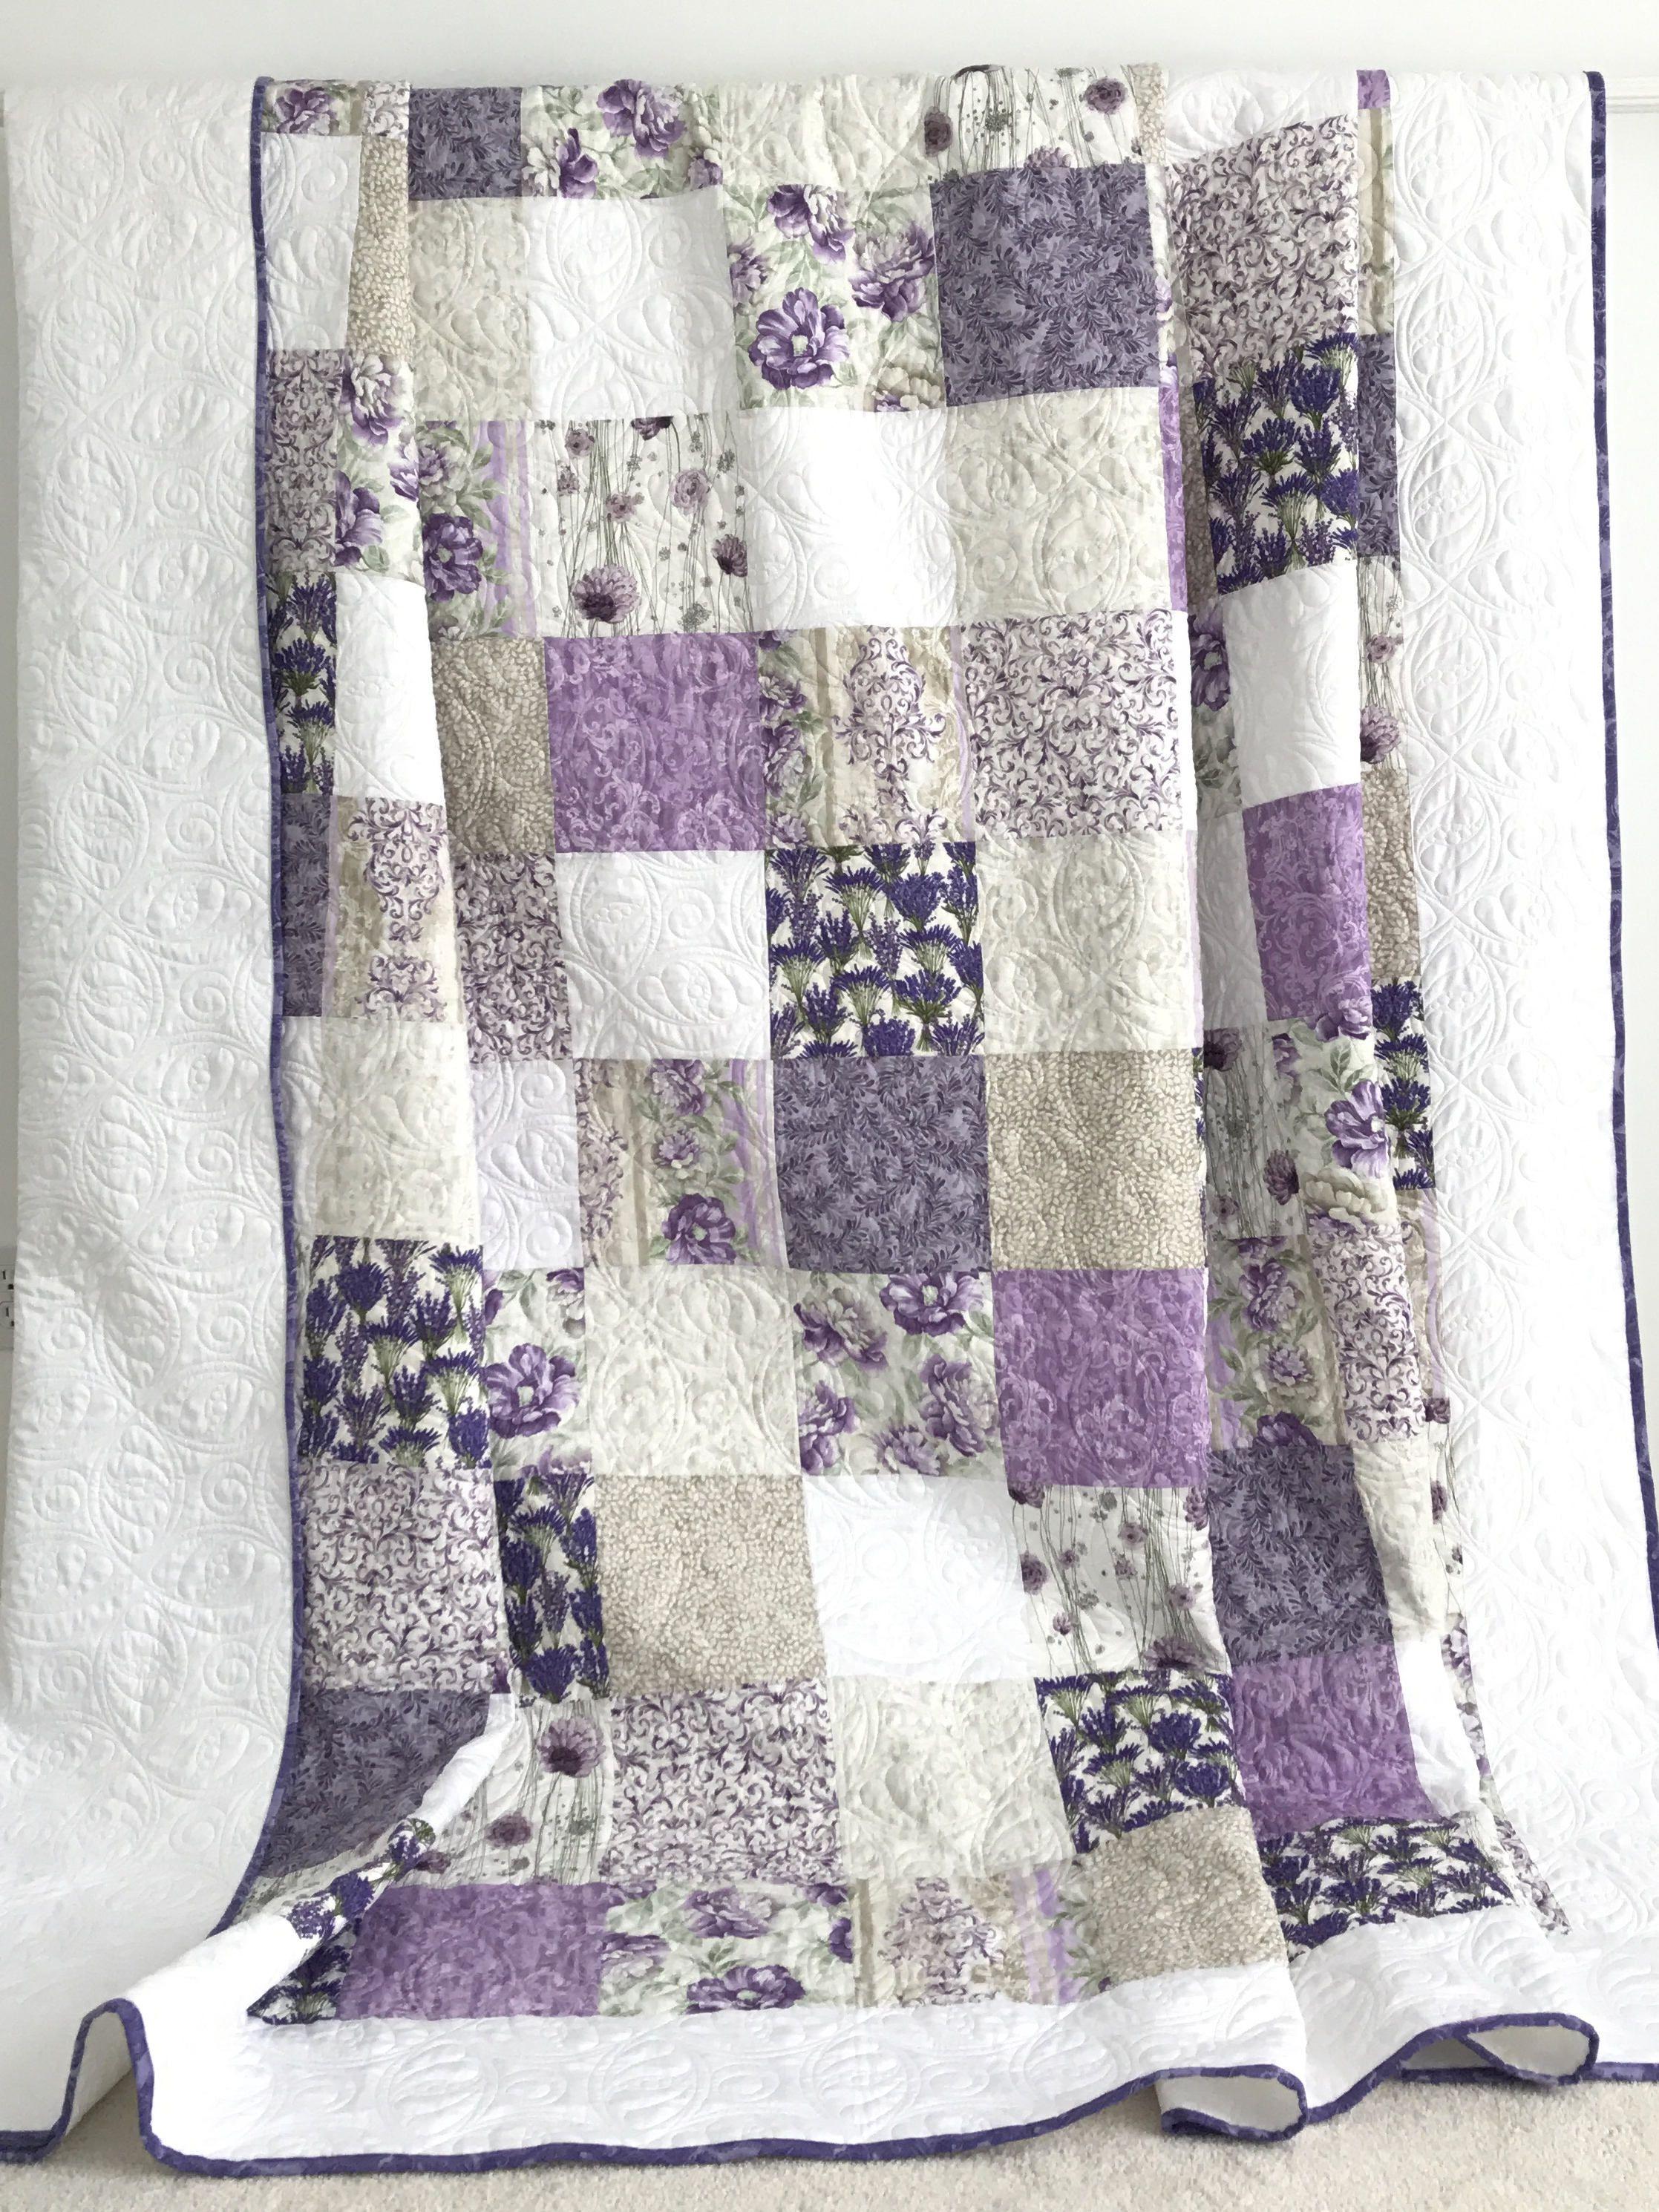 King Patchwork Quilt W Lavender Prints Patchwork Quilt Patterns Purple Quilts Patchwork Quilts